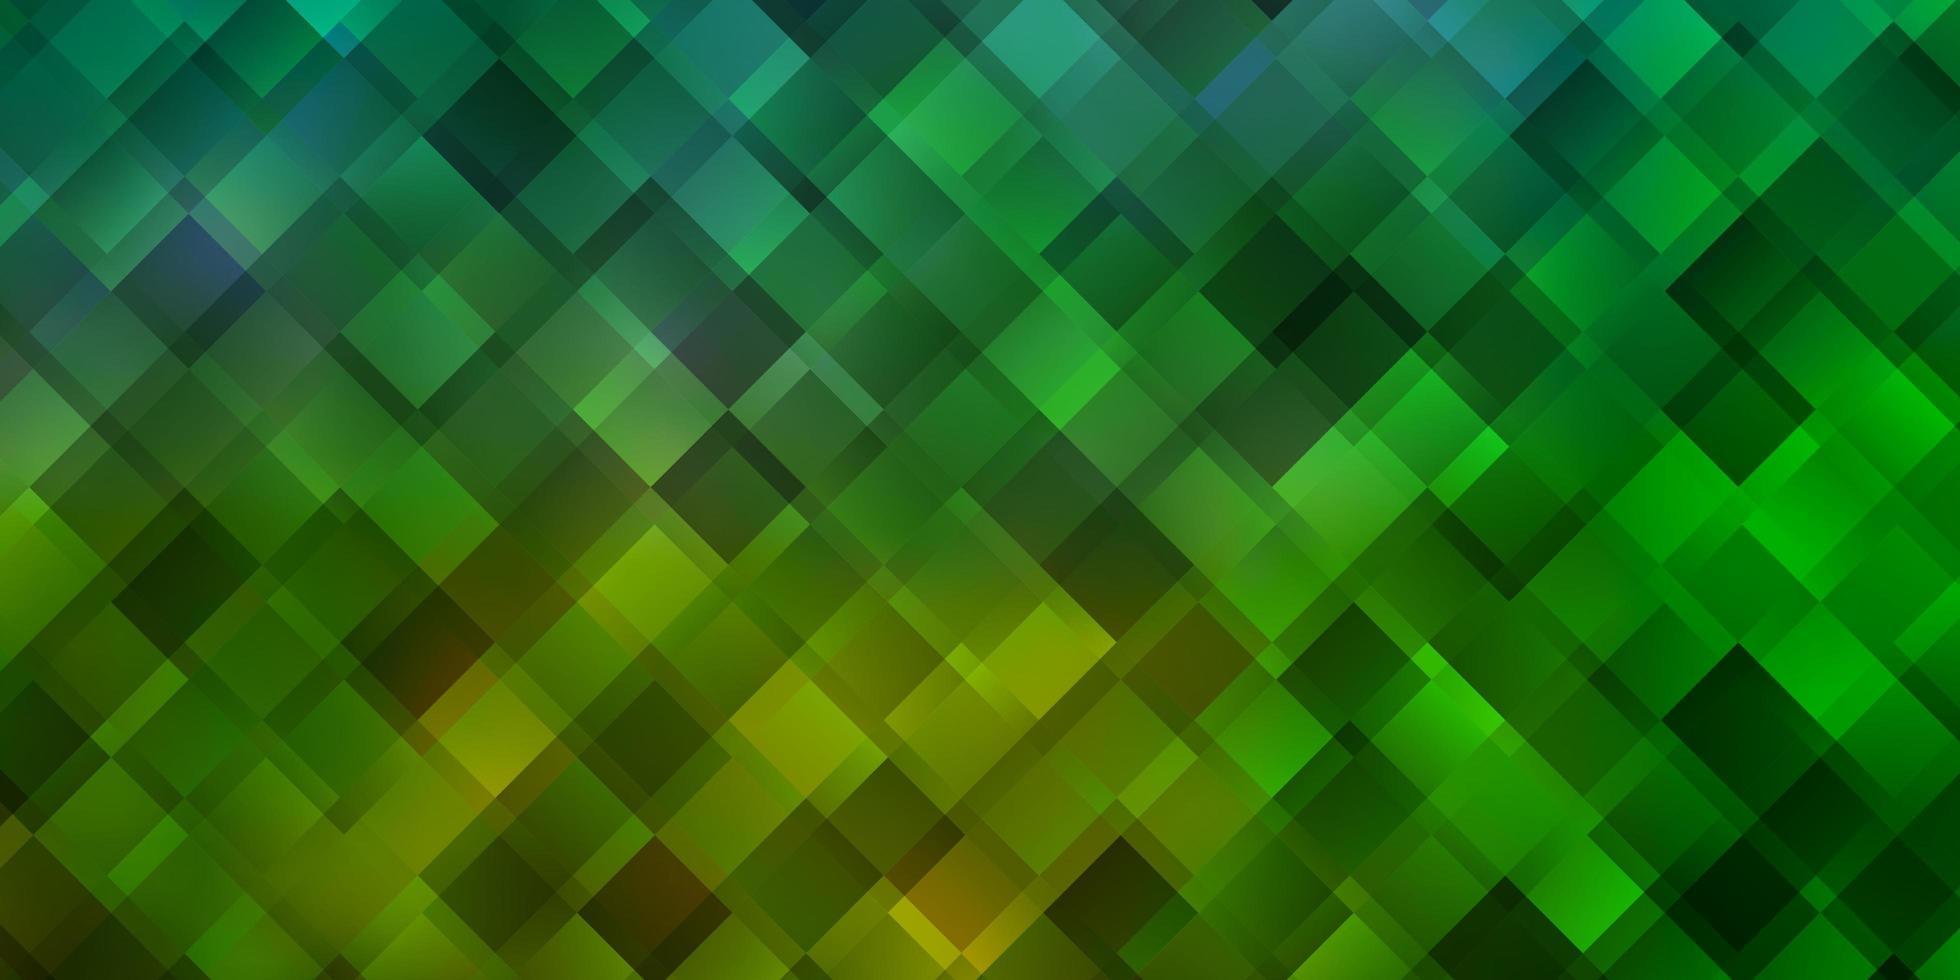 hellgrünes Vektormuster im quadratischen Stil. vektor